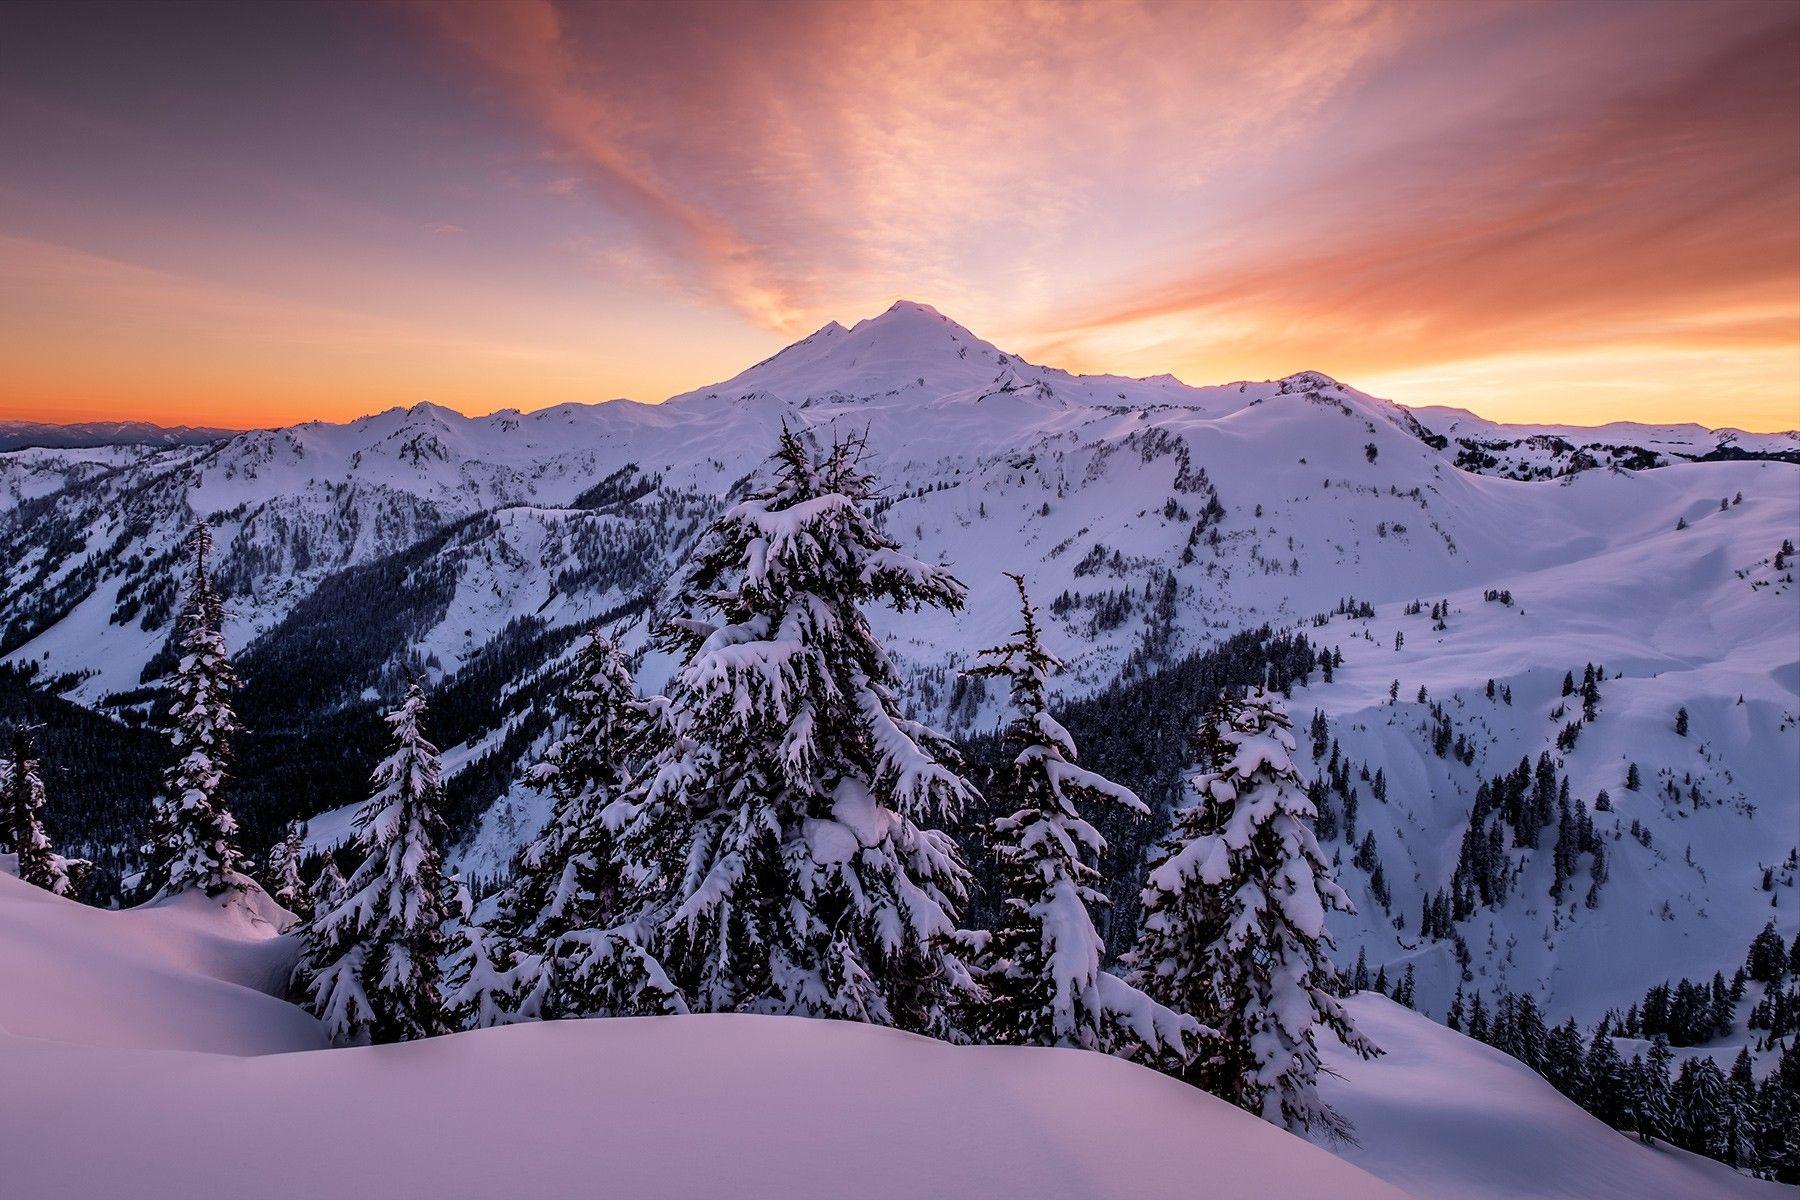 Sunset. Mt Baker, Washington Mountain photos, Earth